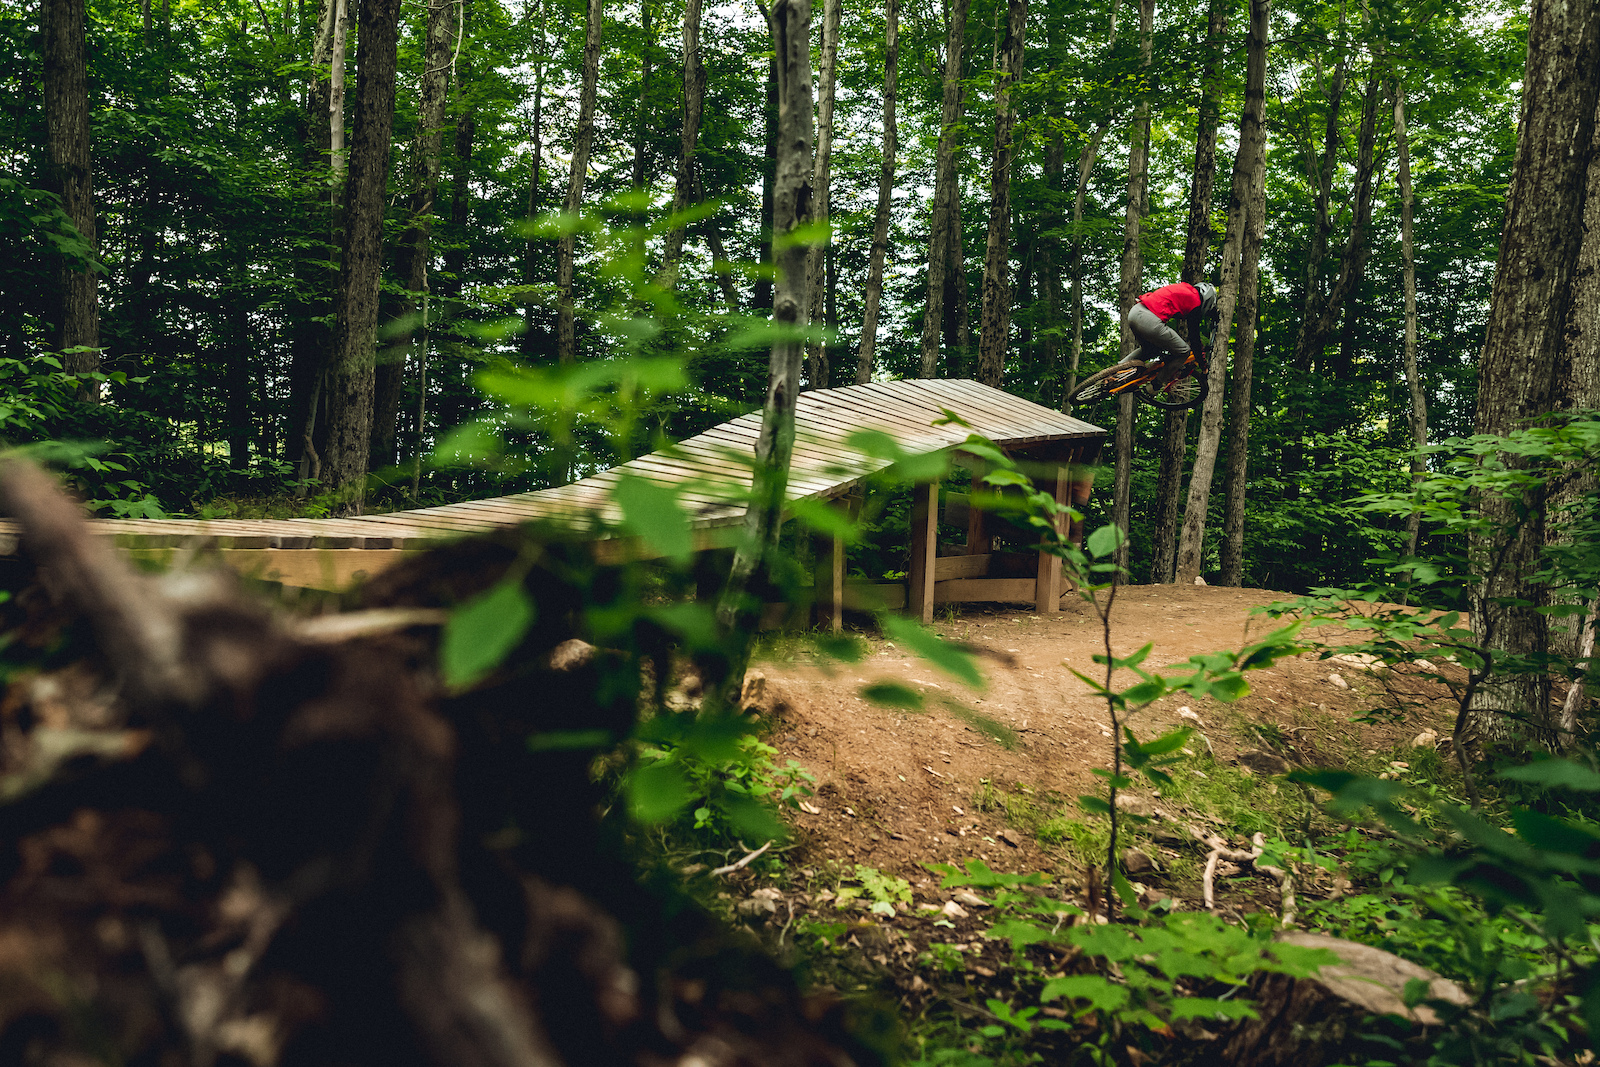 Photos by Peter Jamison. First Impressions Killington Vermont 2021